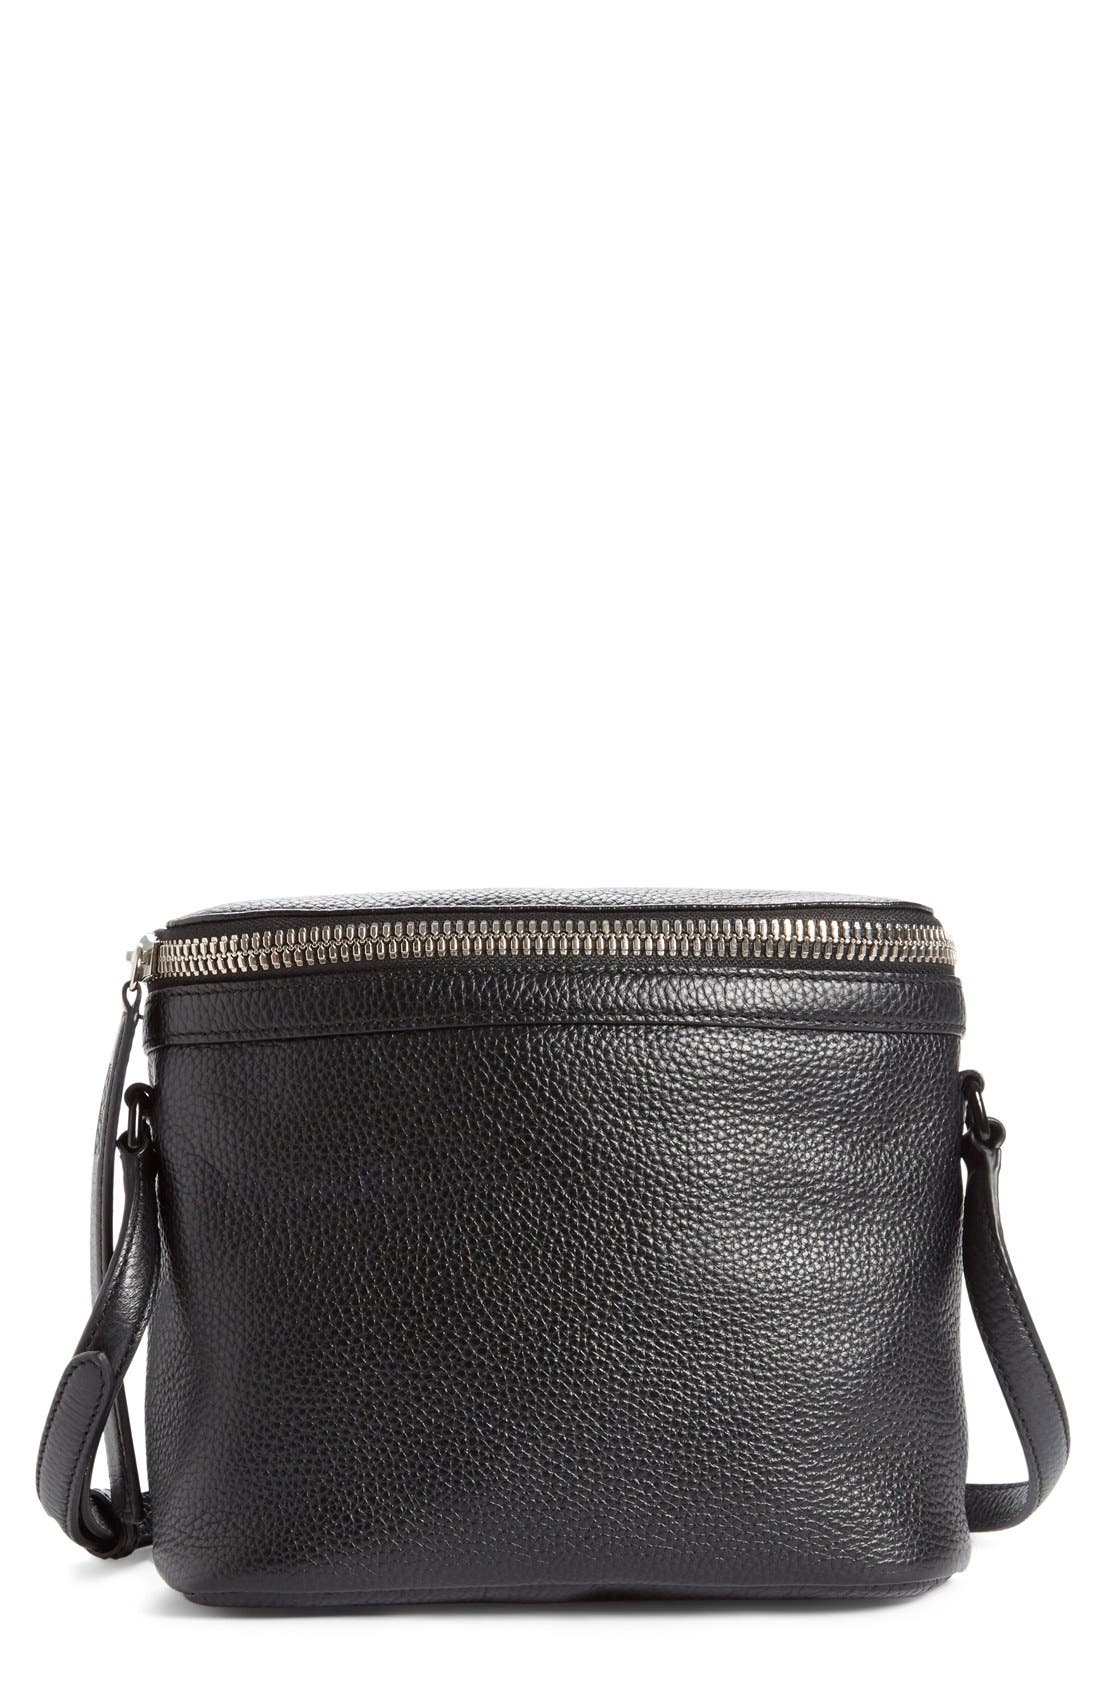 KARA Large Stowaway Leather Crossbody Bag